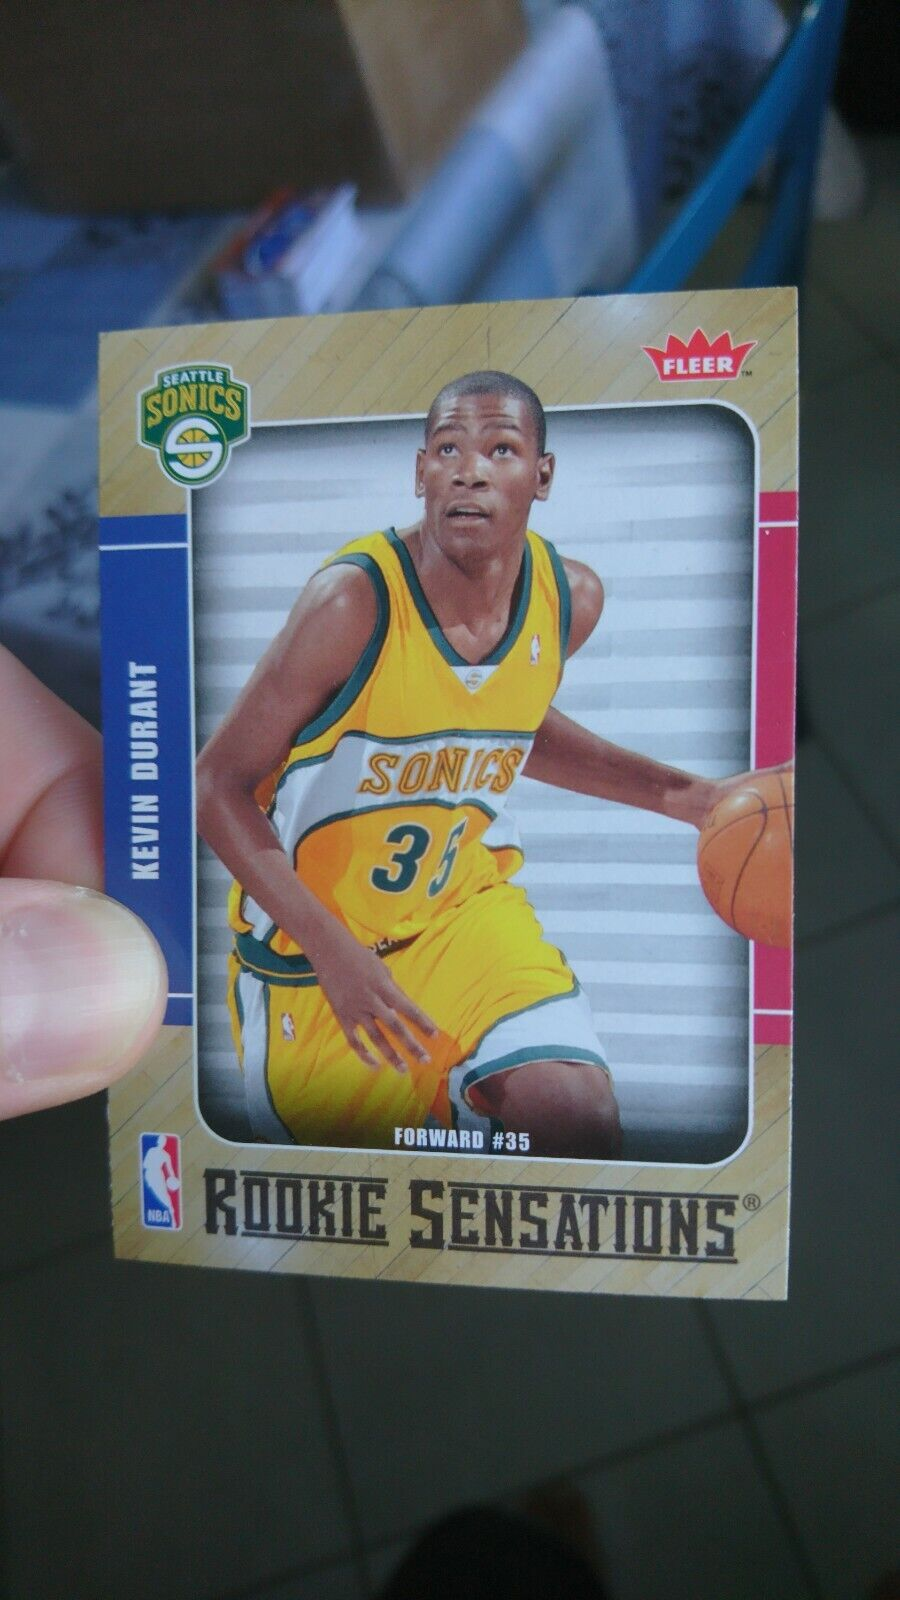 2007-08 fleer nba rookie card kevin durant #35 / seattle sonics